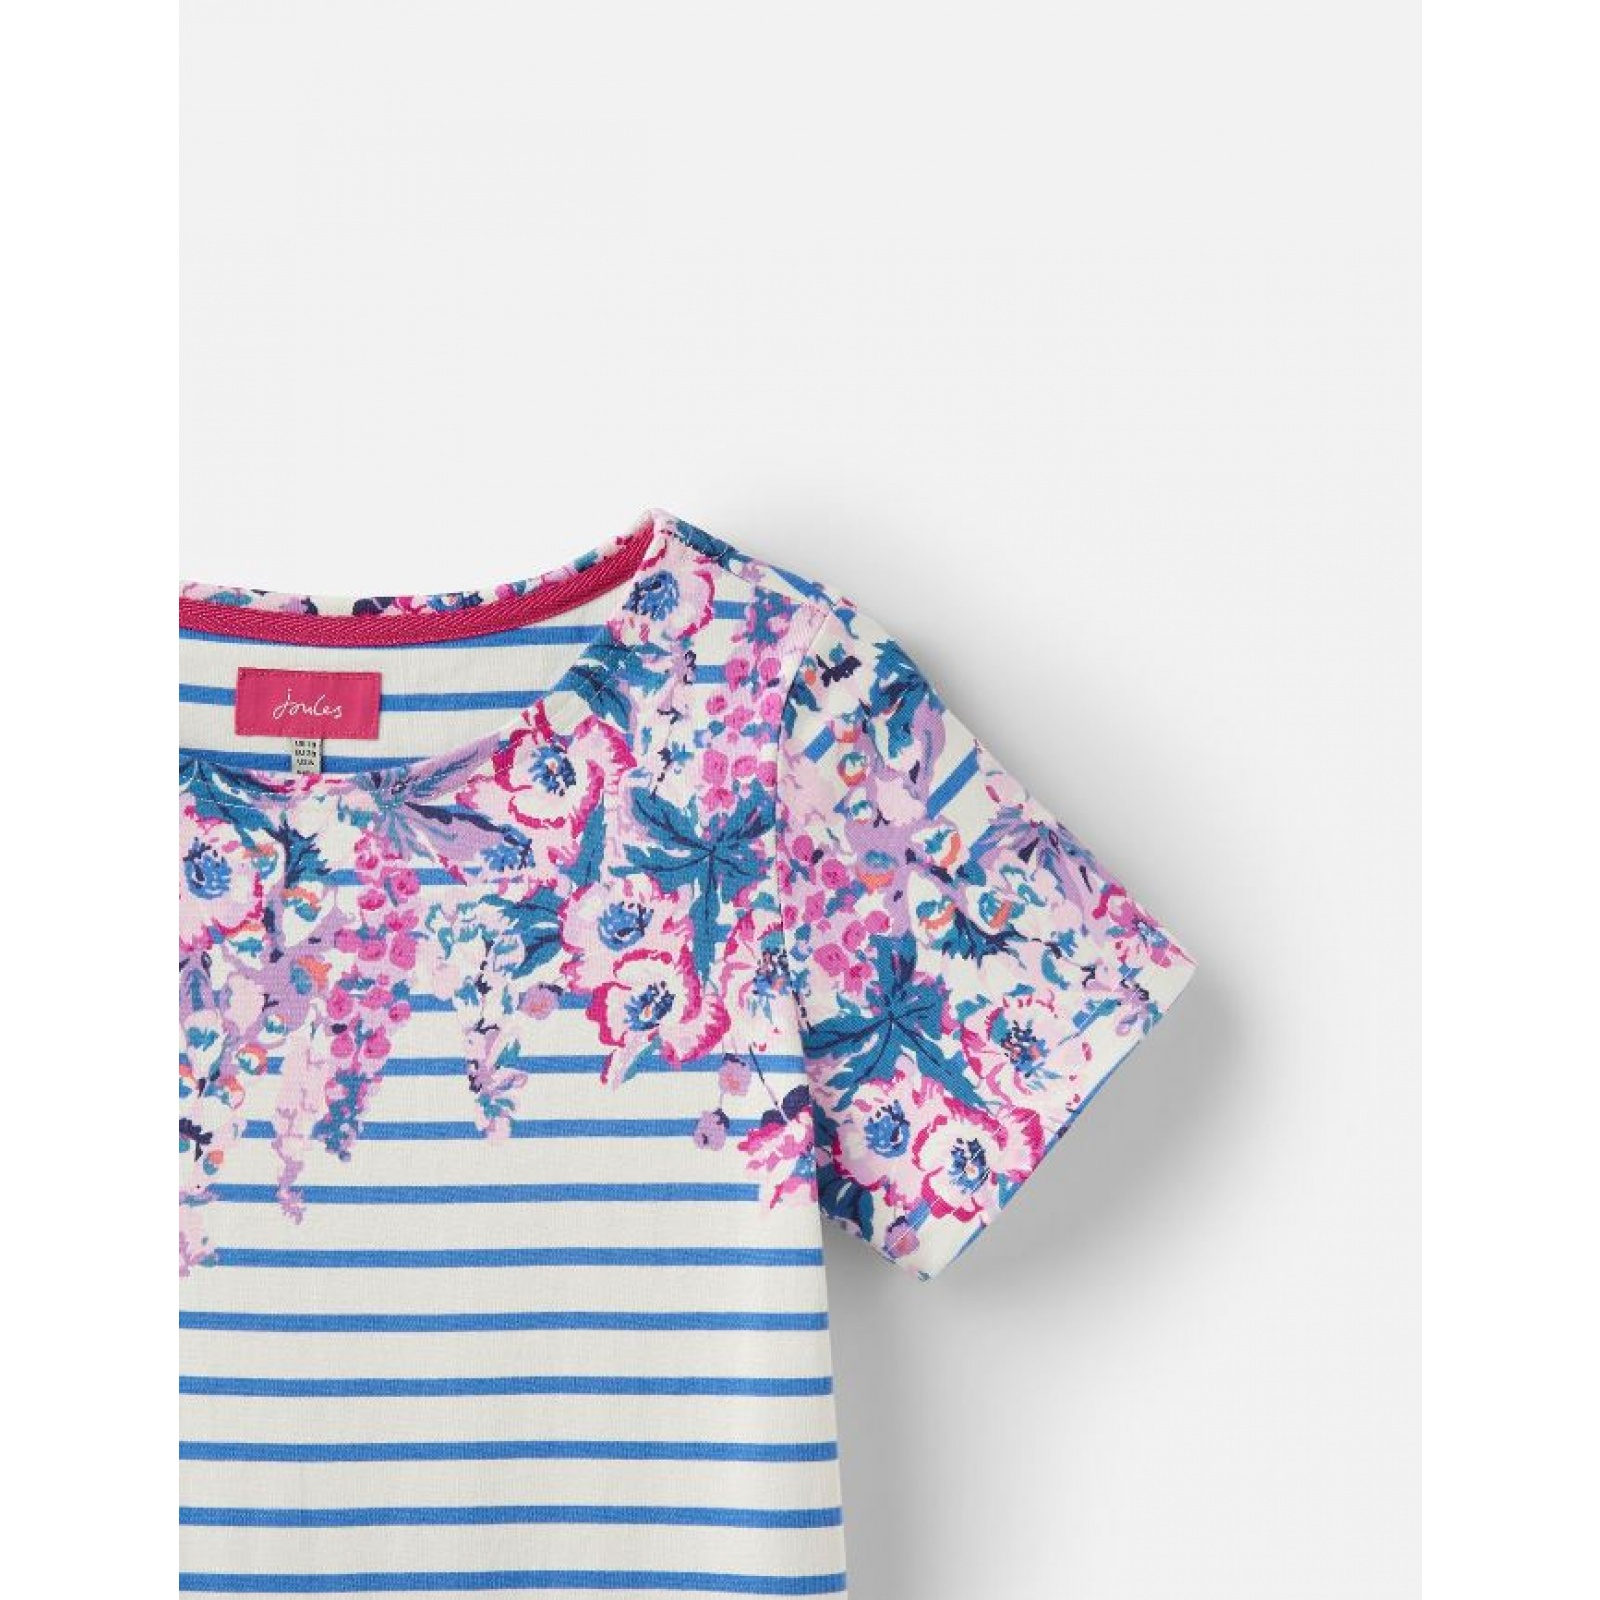 Joules-Riviera-Print-T-Shirt-Dress-with-Short-Sleeves-SS19 thumbnail 7